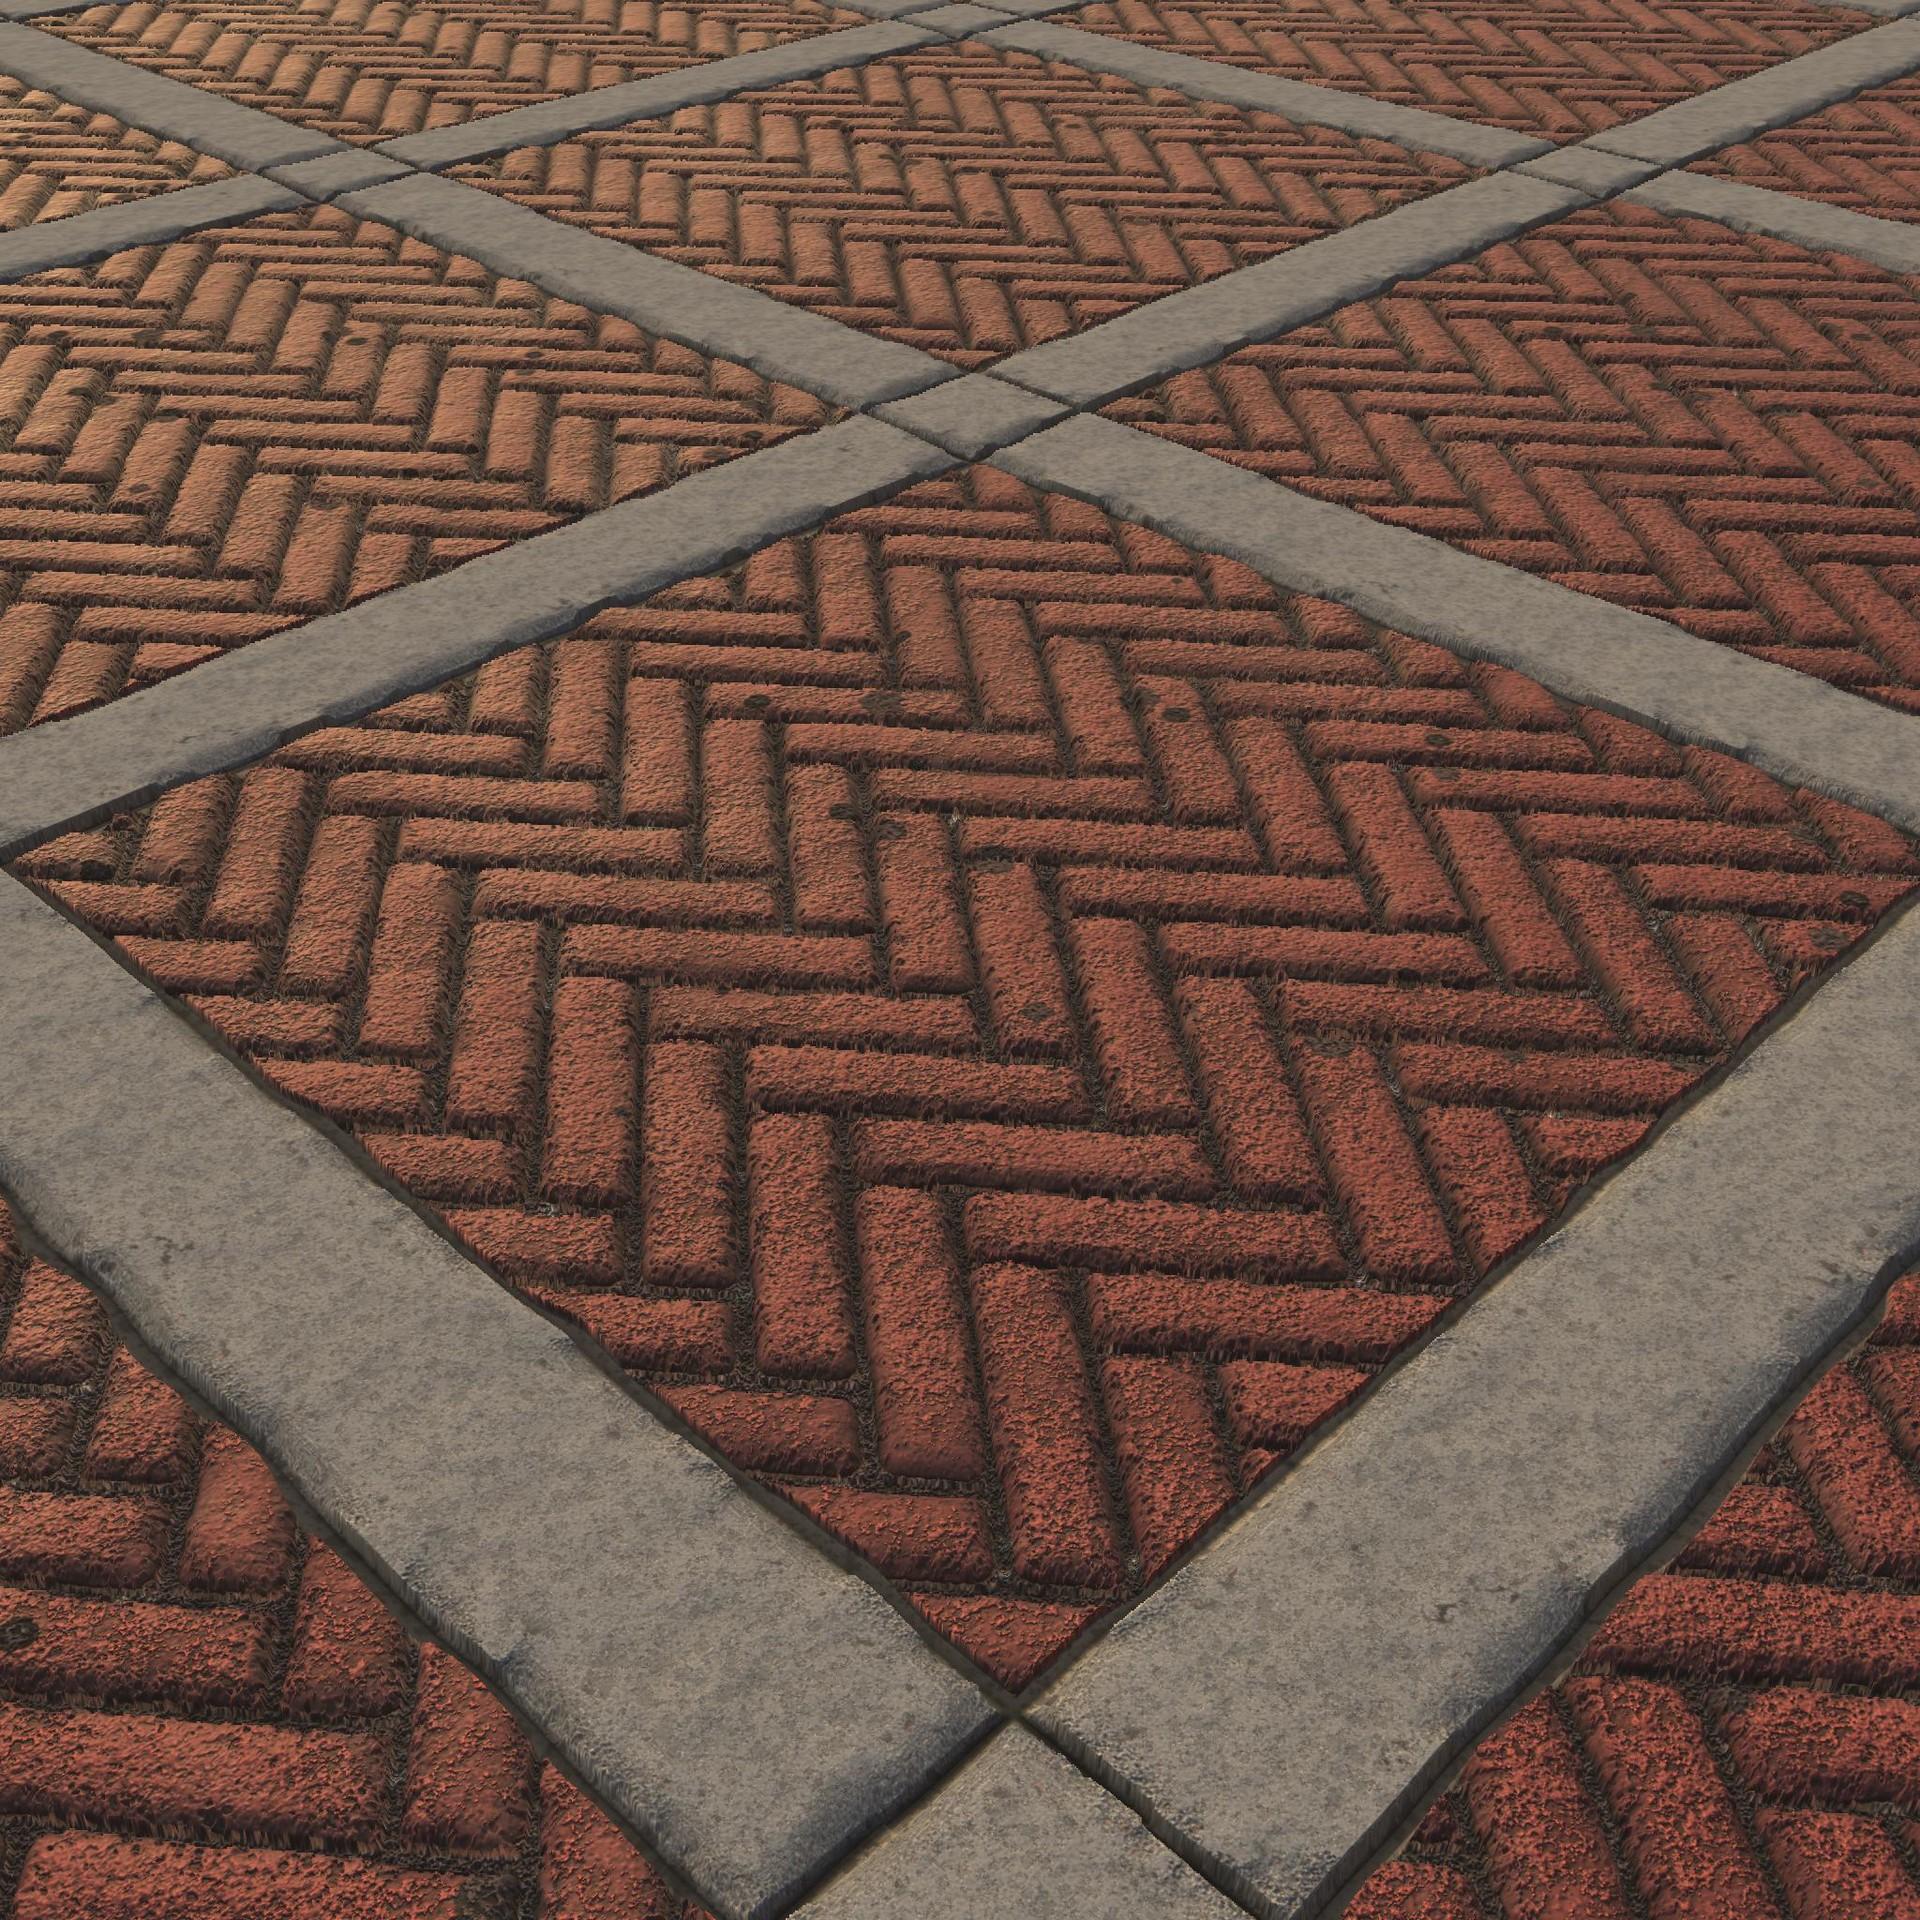 James ray sidewalk 6